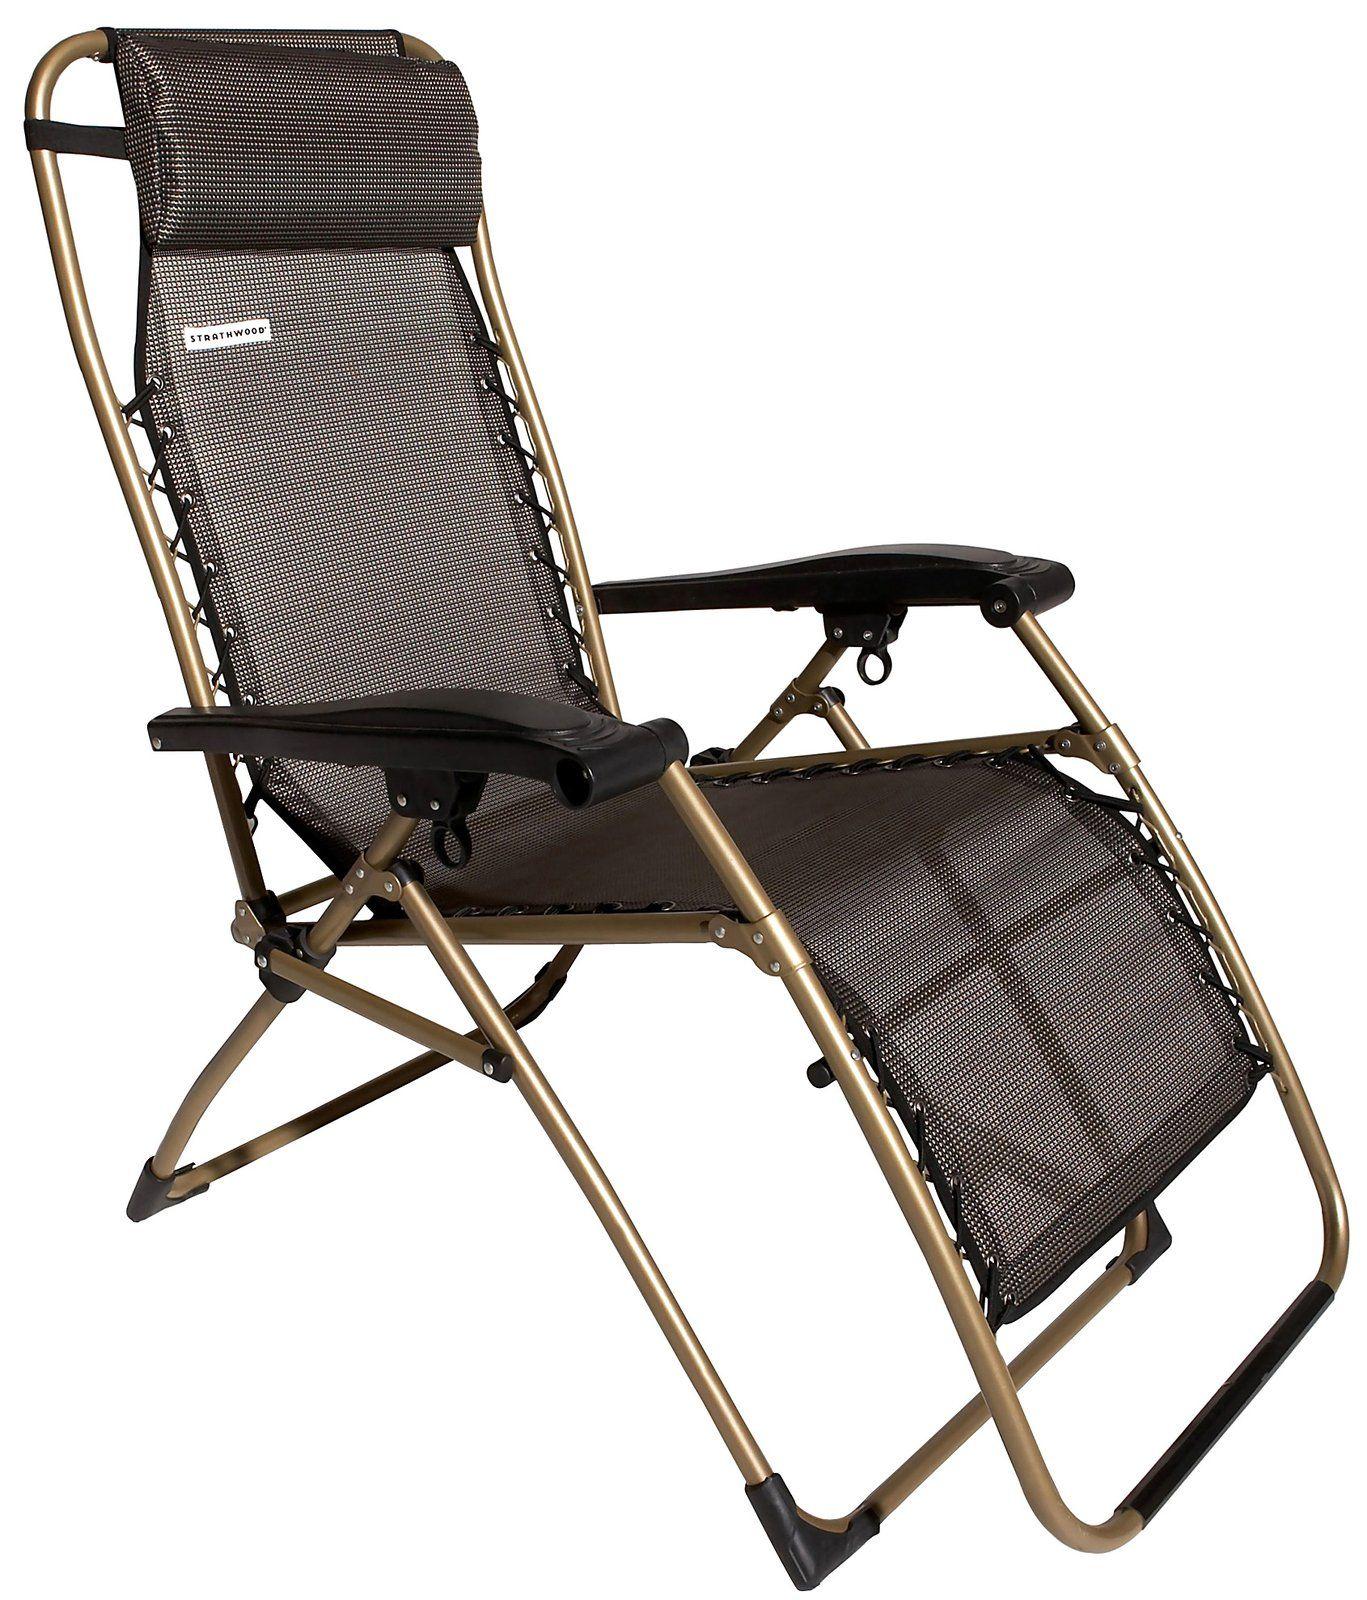 off antigravity adjustable recliner chair dark brown